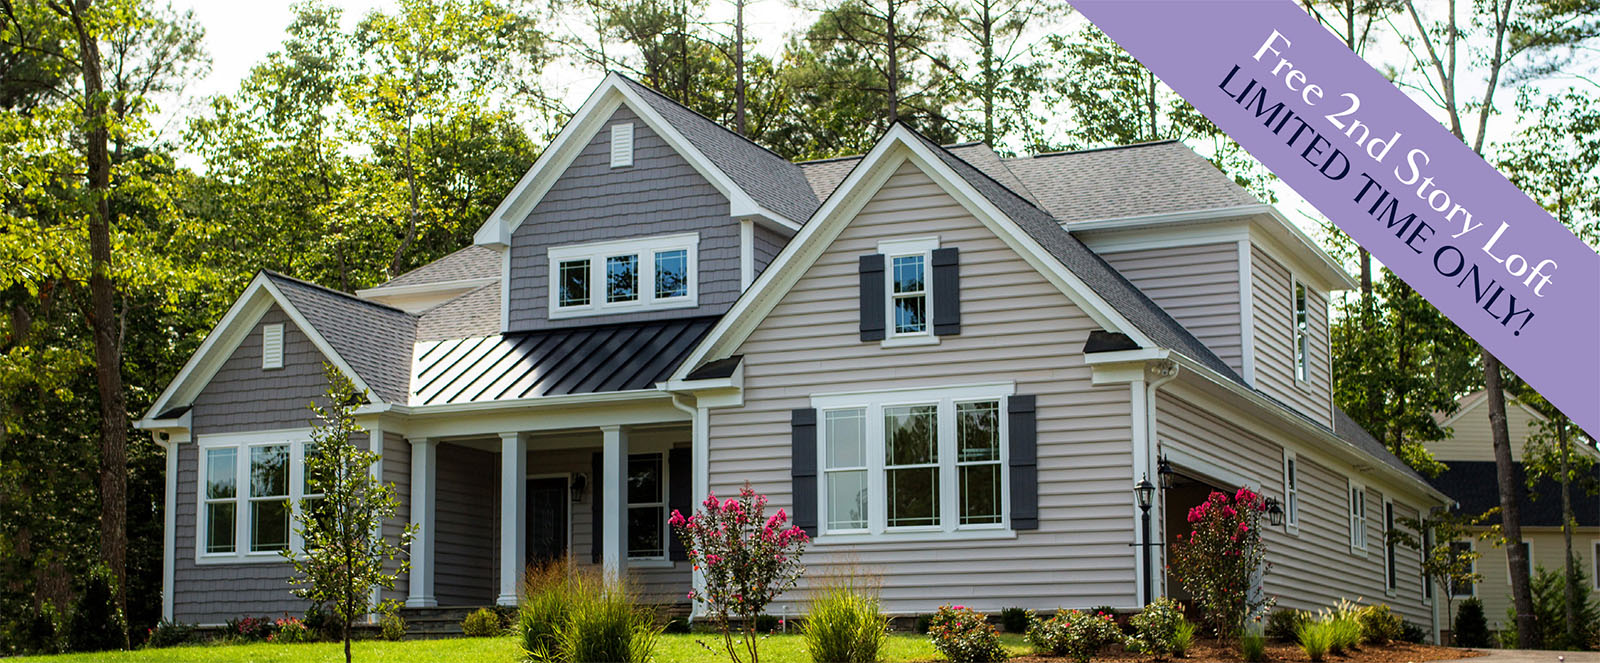 The addison simply home custom home builders in virginia for Custom home builders fredericksburg va